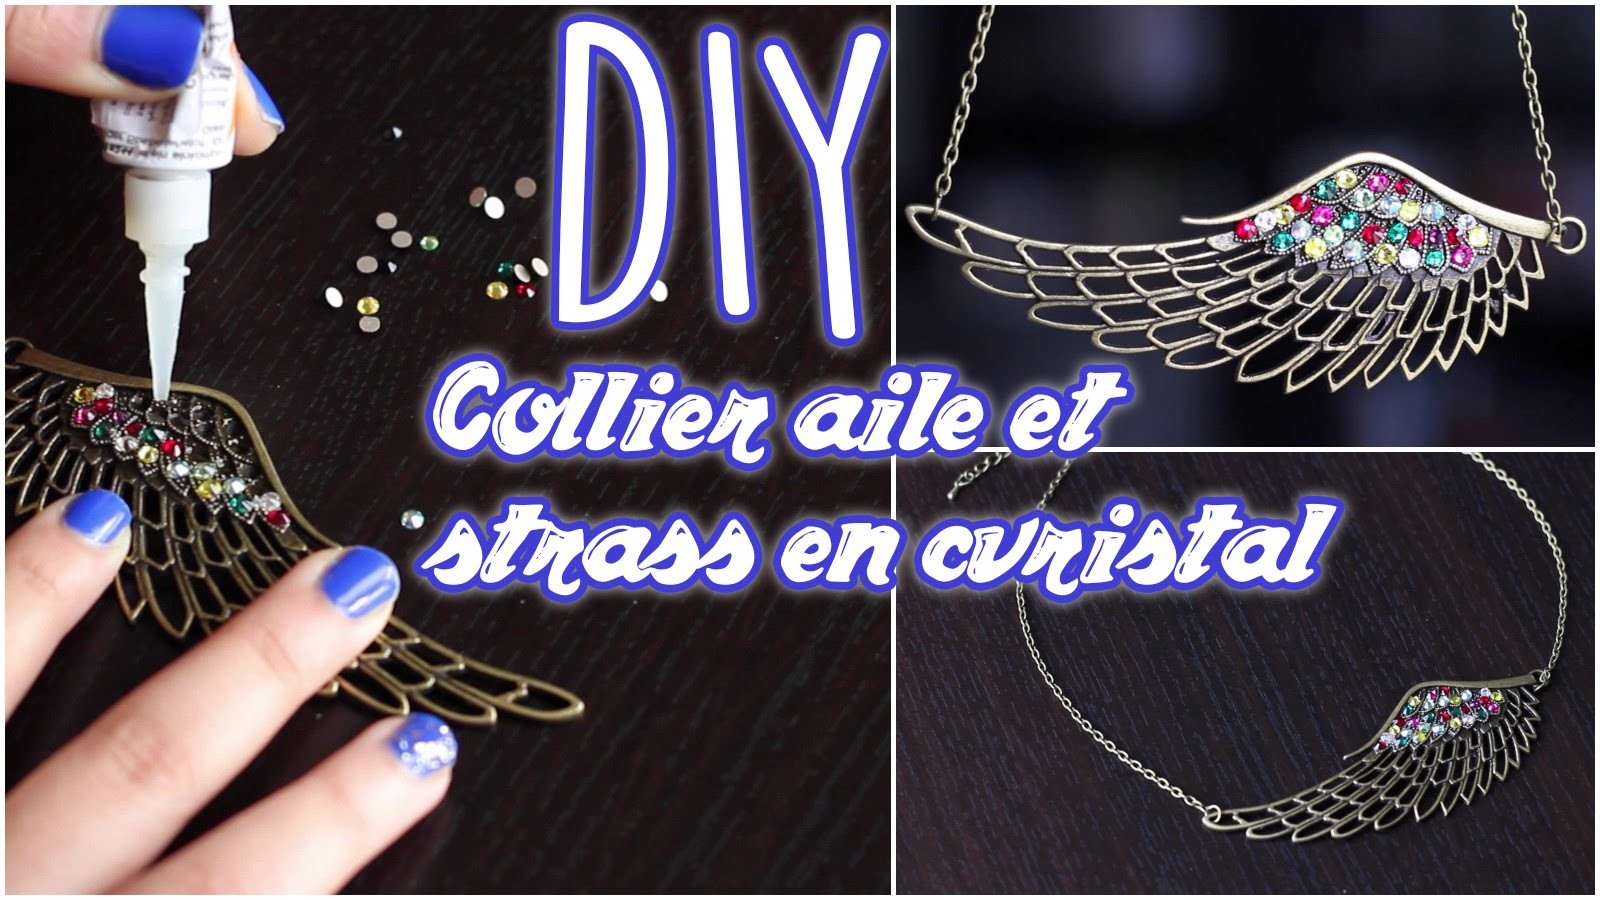 DIY # TUTO Collier aile et strass en cristal - Customiser une breloque